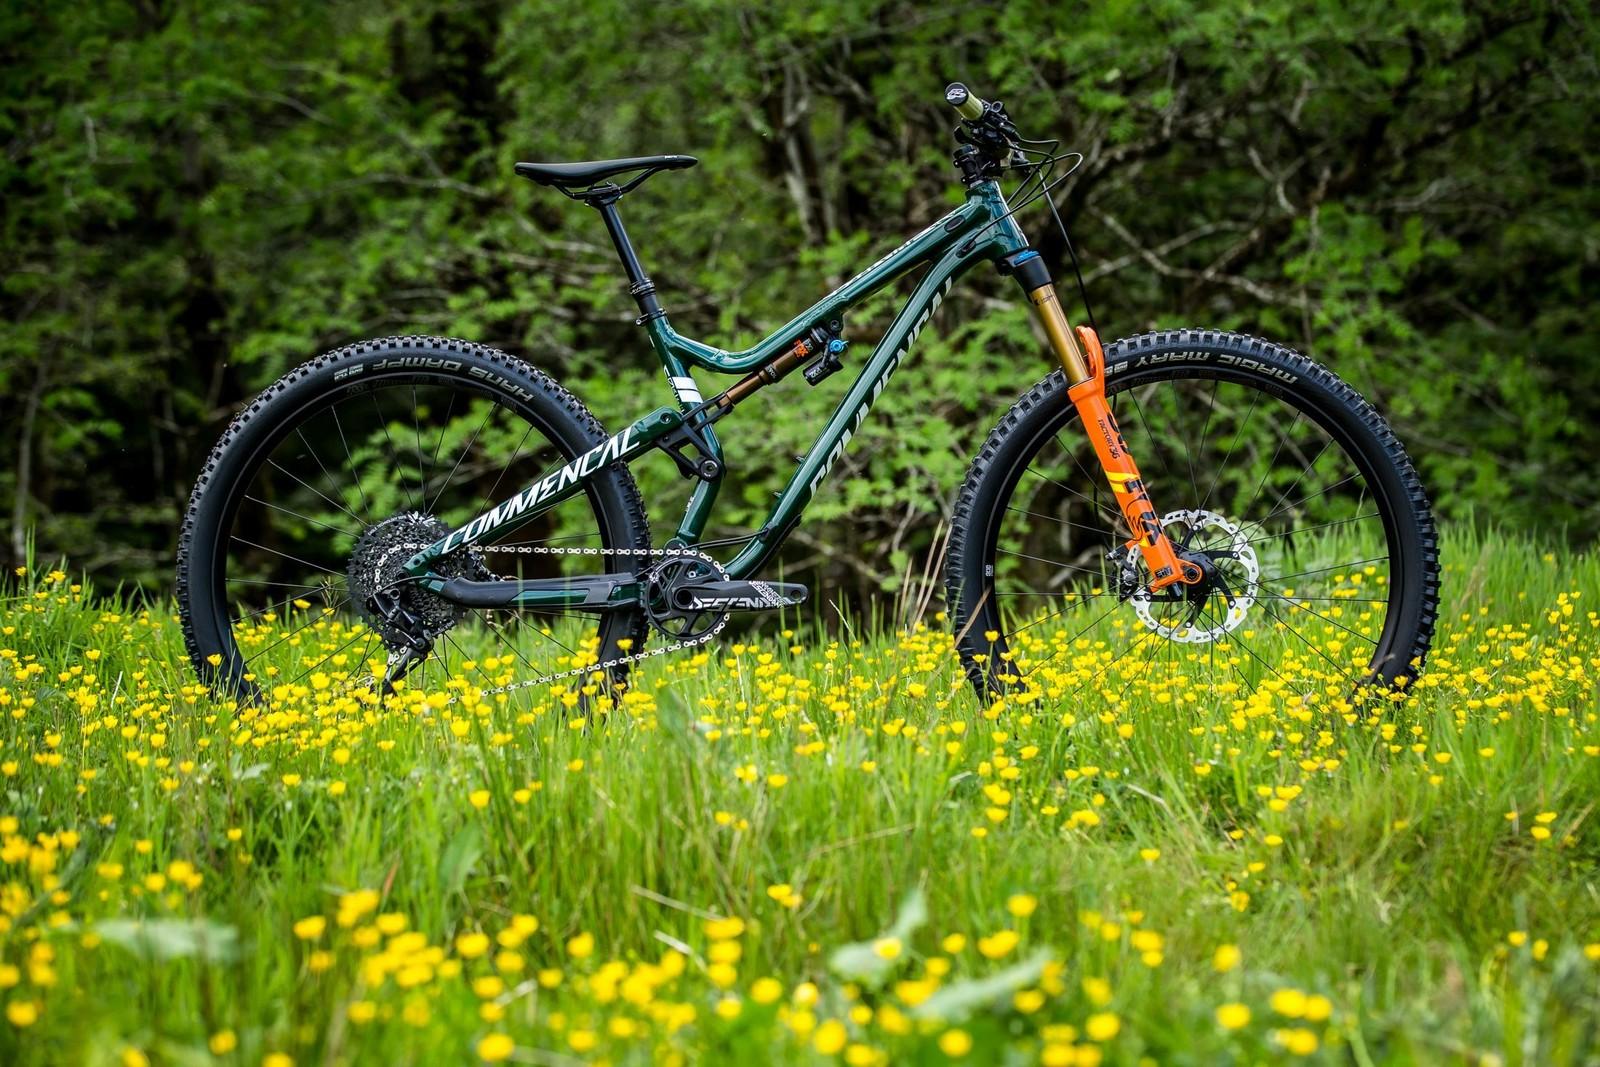 Commencal TR 29 UK Edition - Commencal Meta TR 29 - Mountain Biking Pictures - Vital MTB